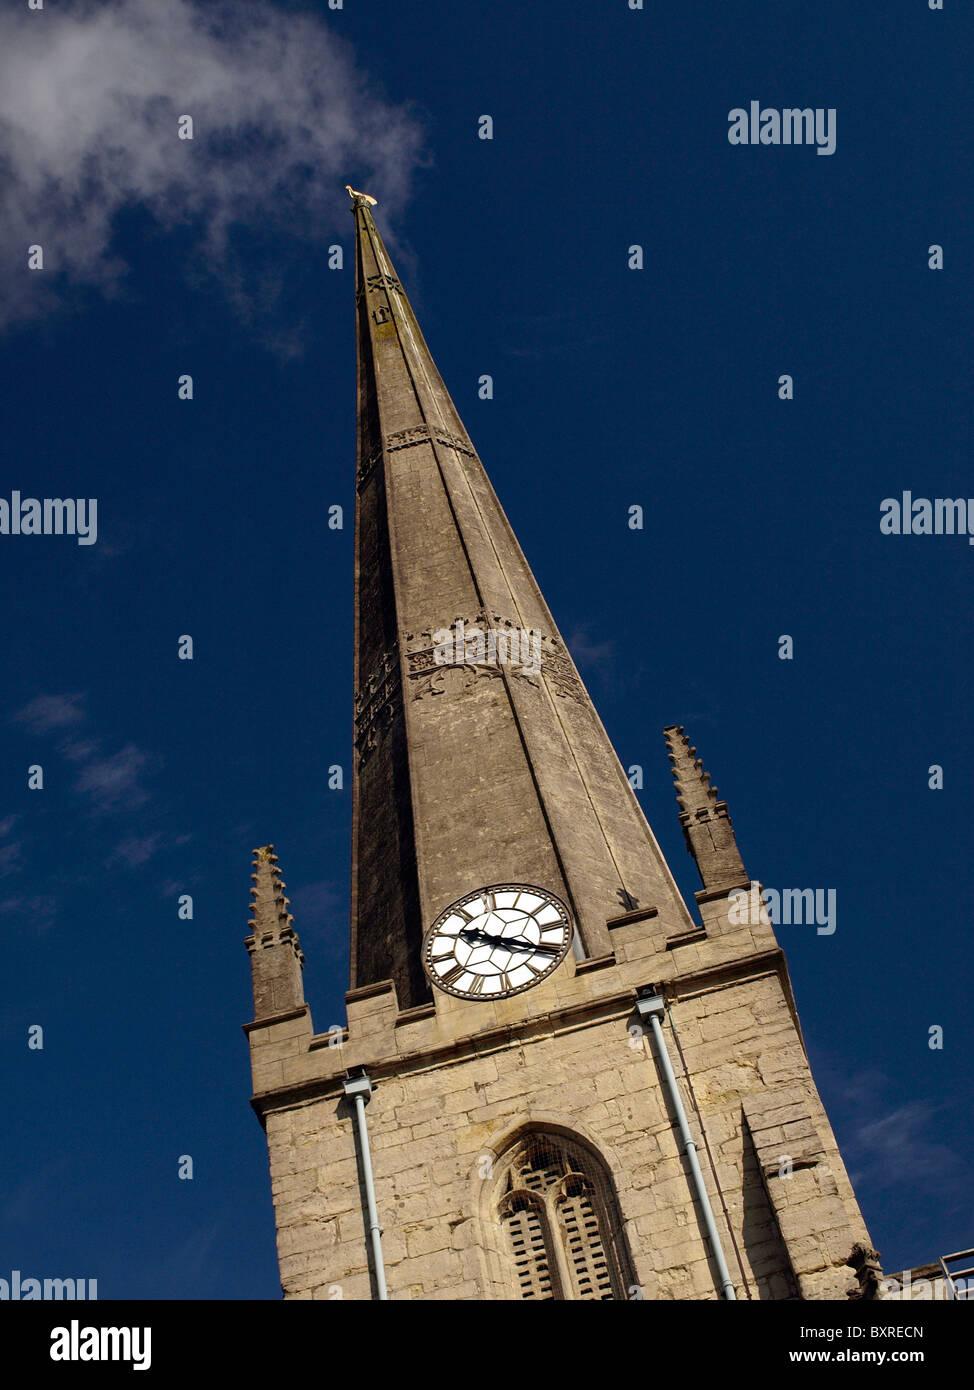 Church steeple, Trowbridge, Wiltshire, UK - Stock Image